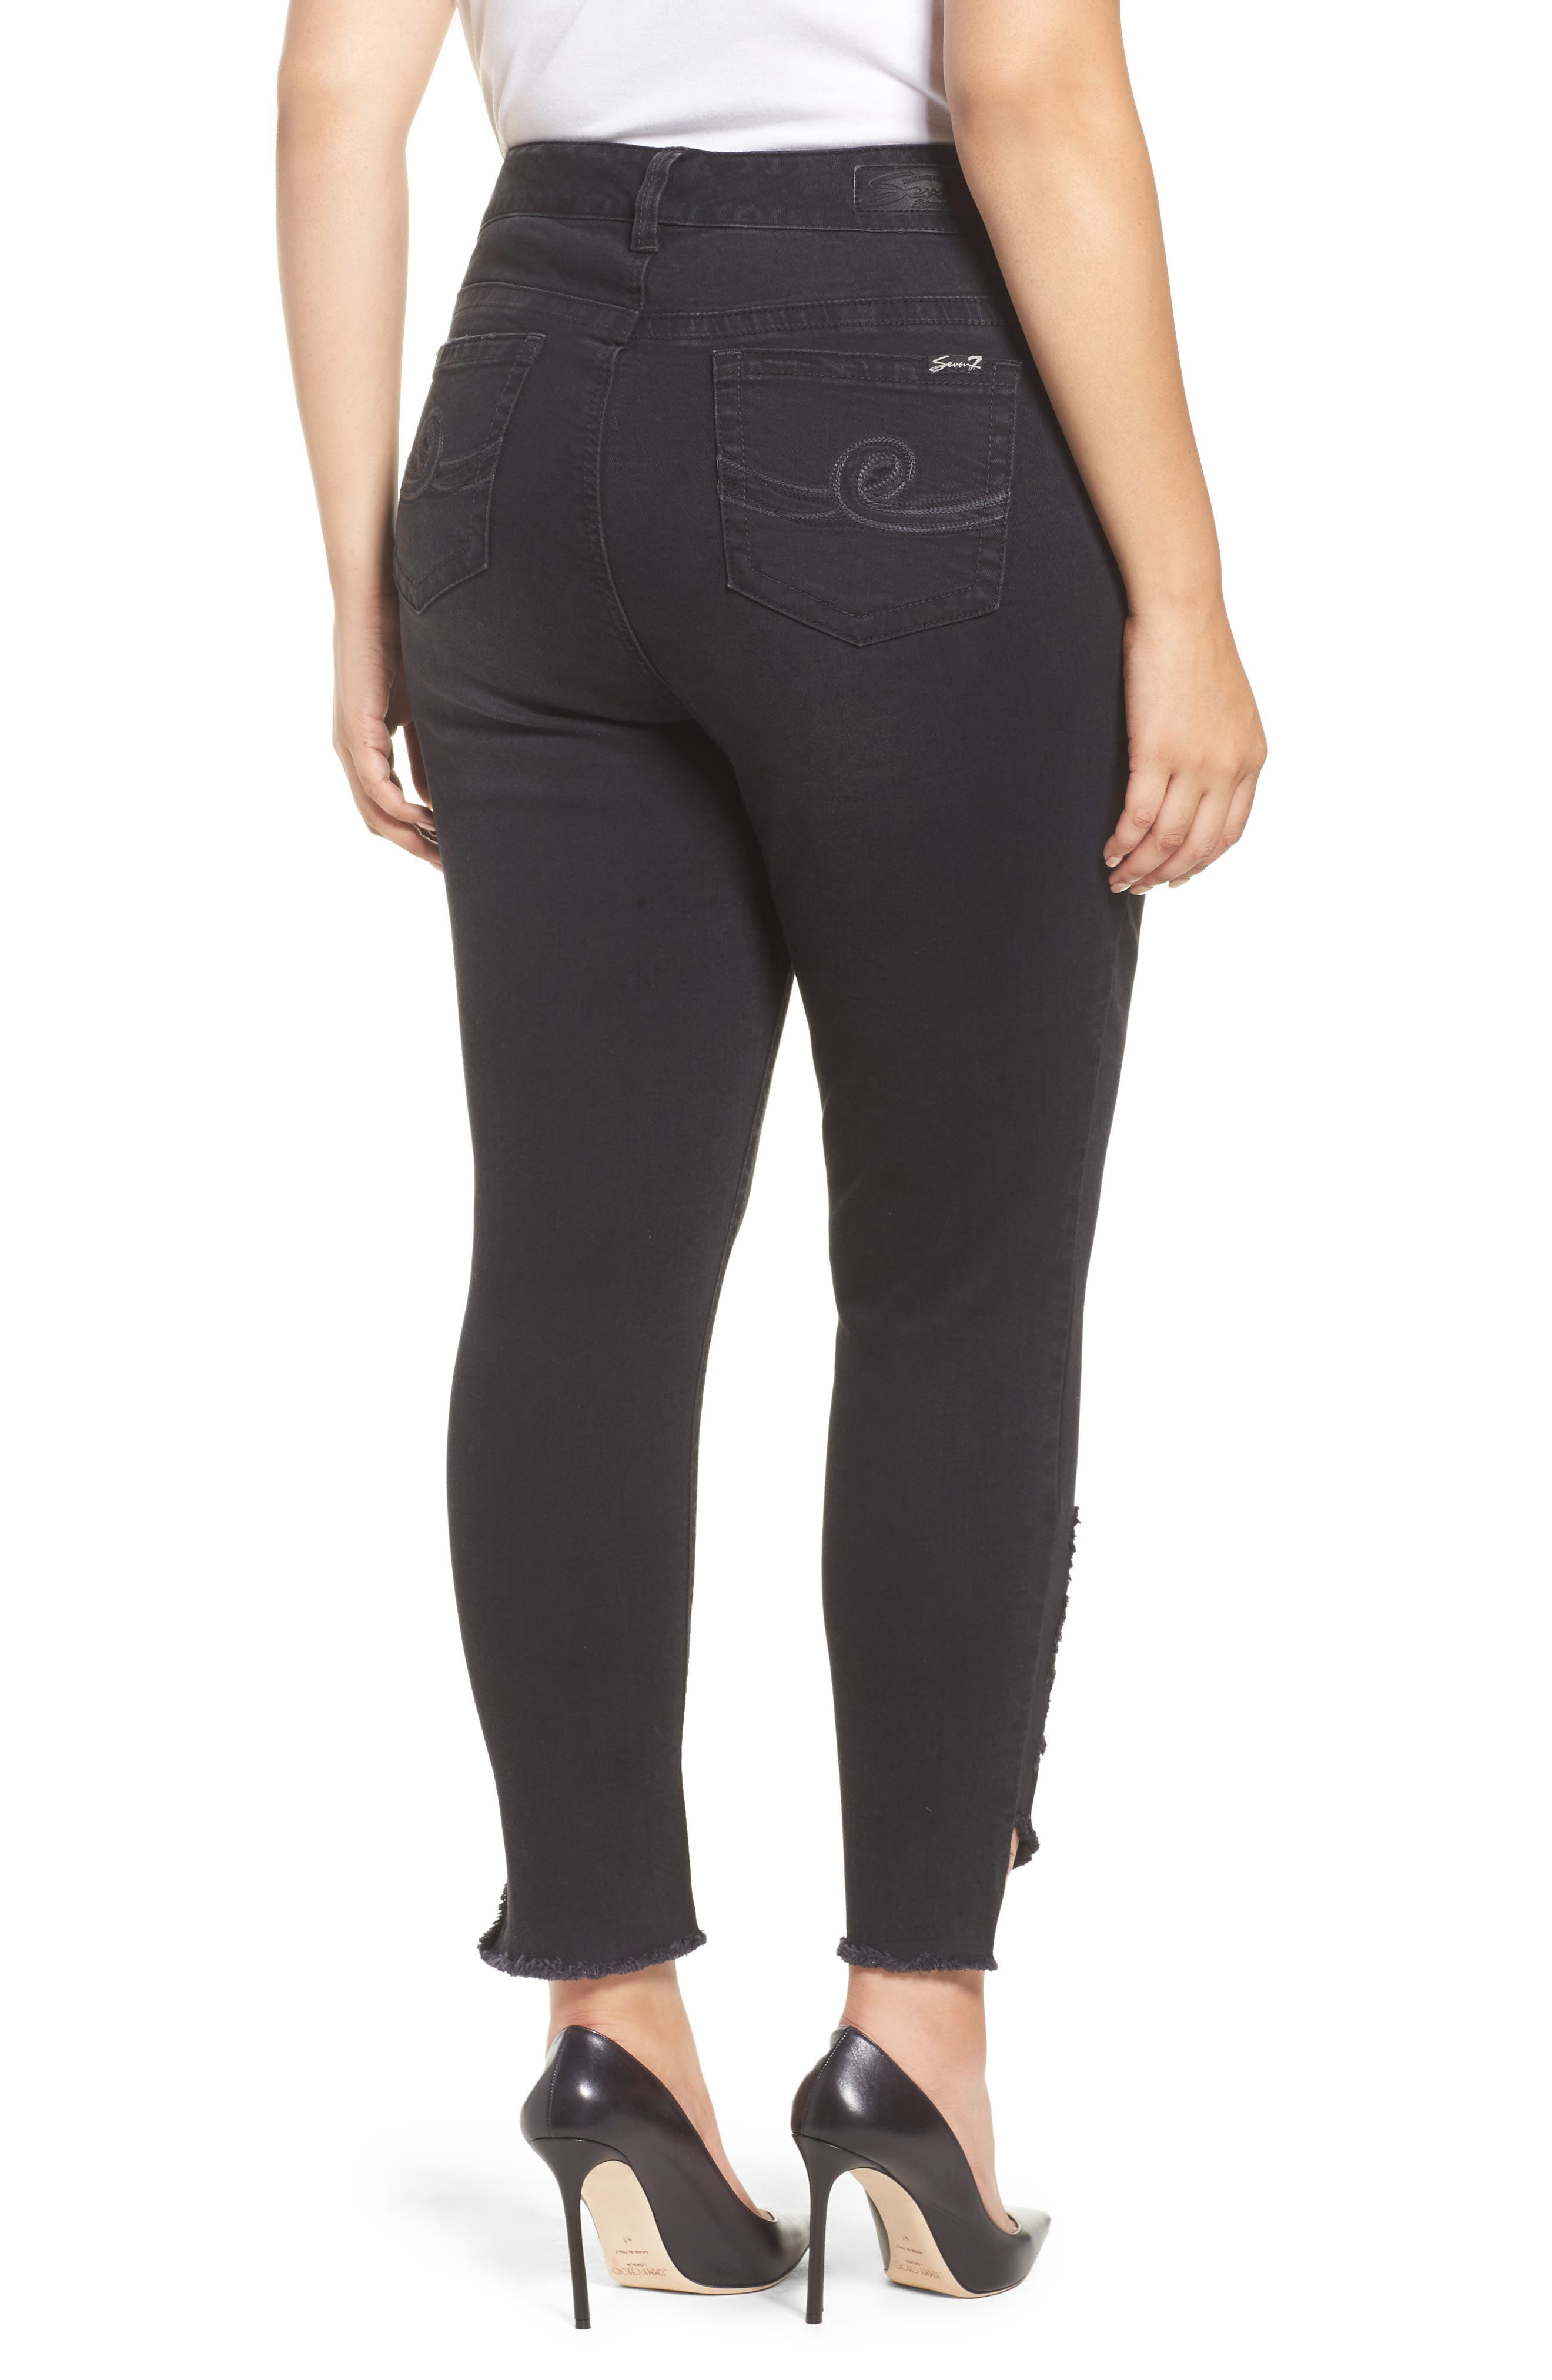 SEVEN7,                             Distressed Slant Raw Hem Skinny Jeans,                             Alternate thumbnail 2, color,                             001